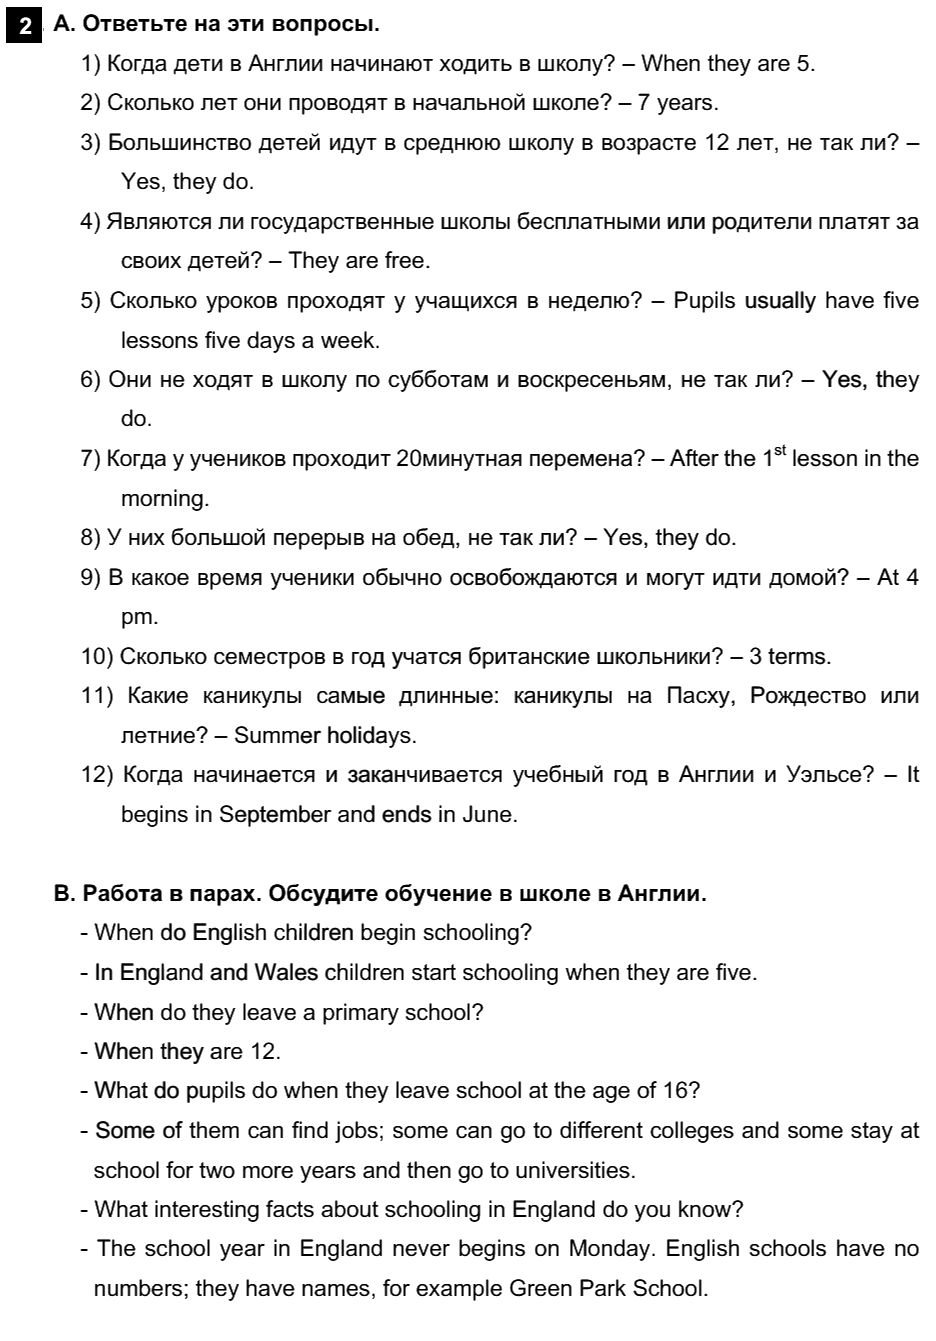 Английский язык 7 класс Афанасьева О. В. Unit 1. Школа и учёба / Шаг 5: 2